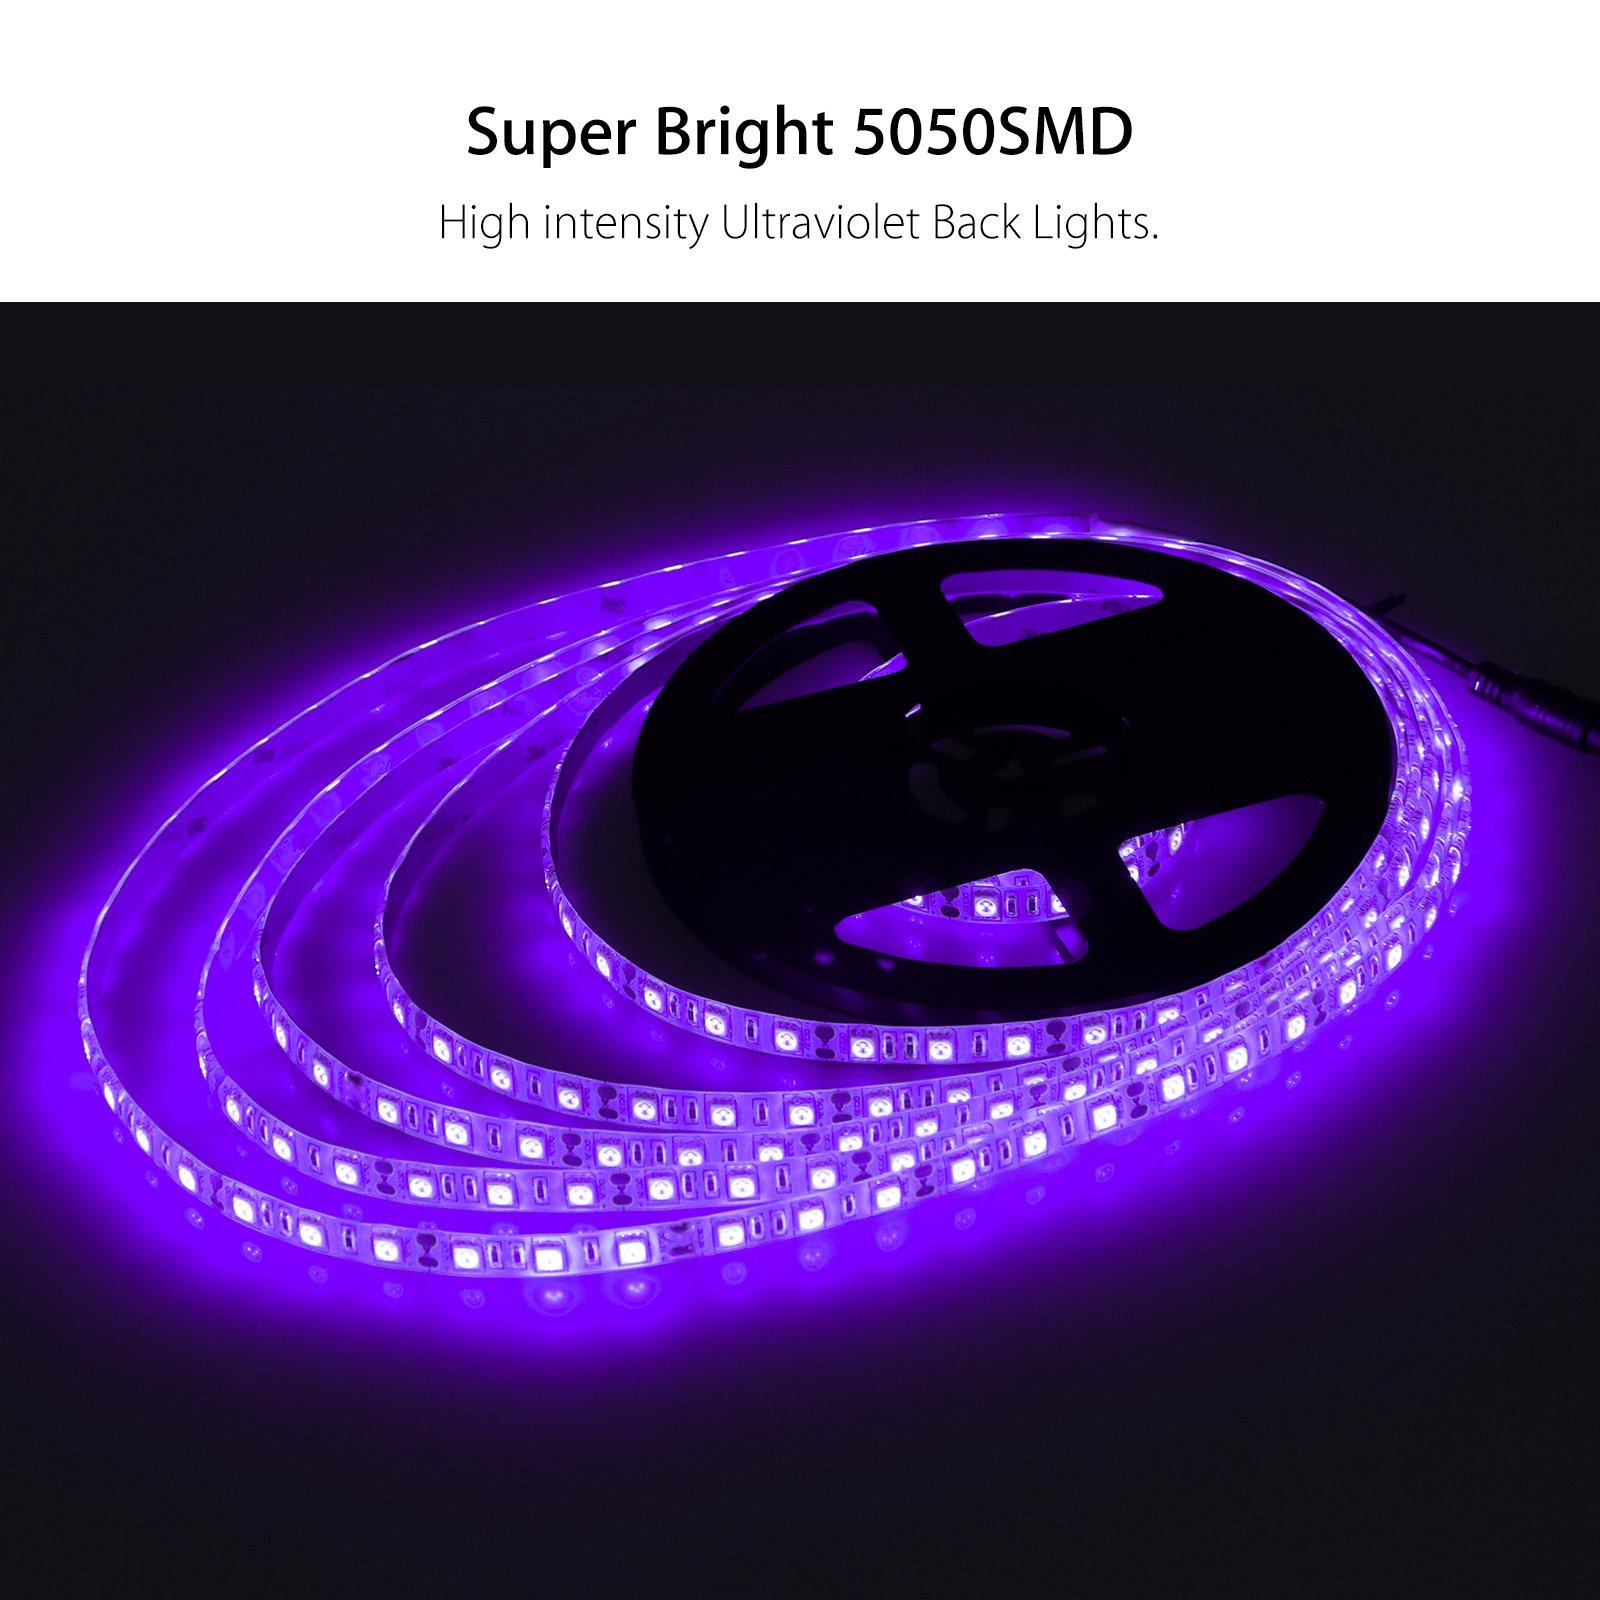 LinkStyle UV Black Lights LED Strip, 16.4Ft 300 LEDs 5050 SMD Ultraviolet Light UV LED Strip Light, Flexible & IP65 Waterproof DC 12V Purple Light Night Fishing(Power Adapter Not Included) by LinkStyle (Image #2)